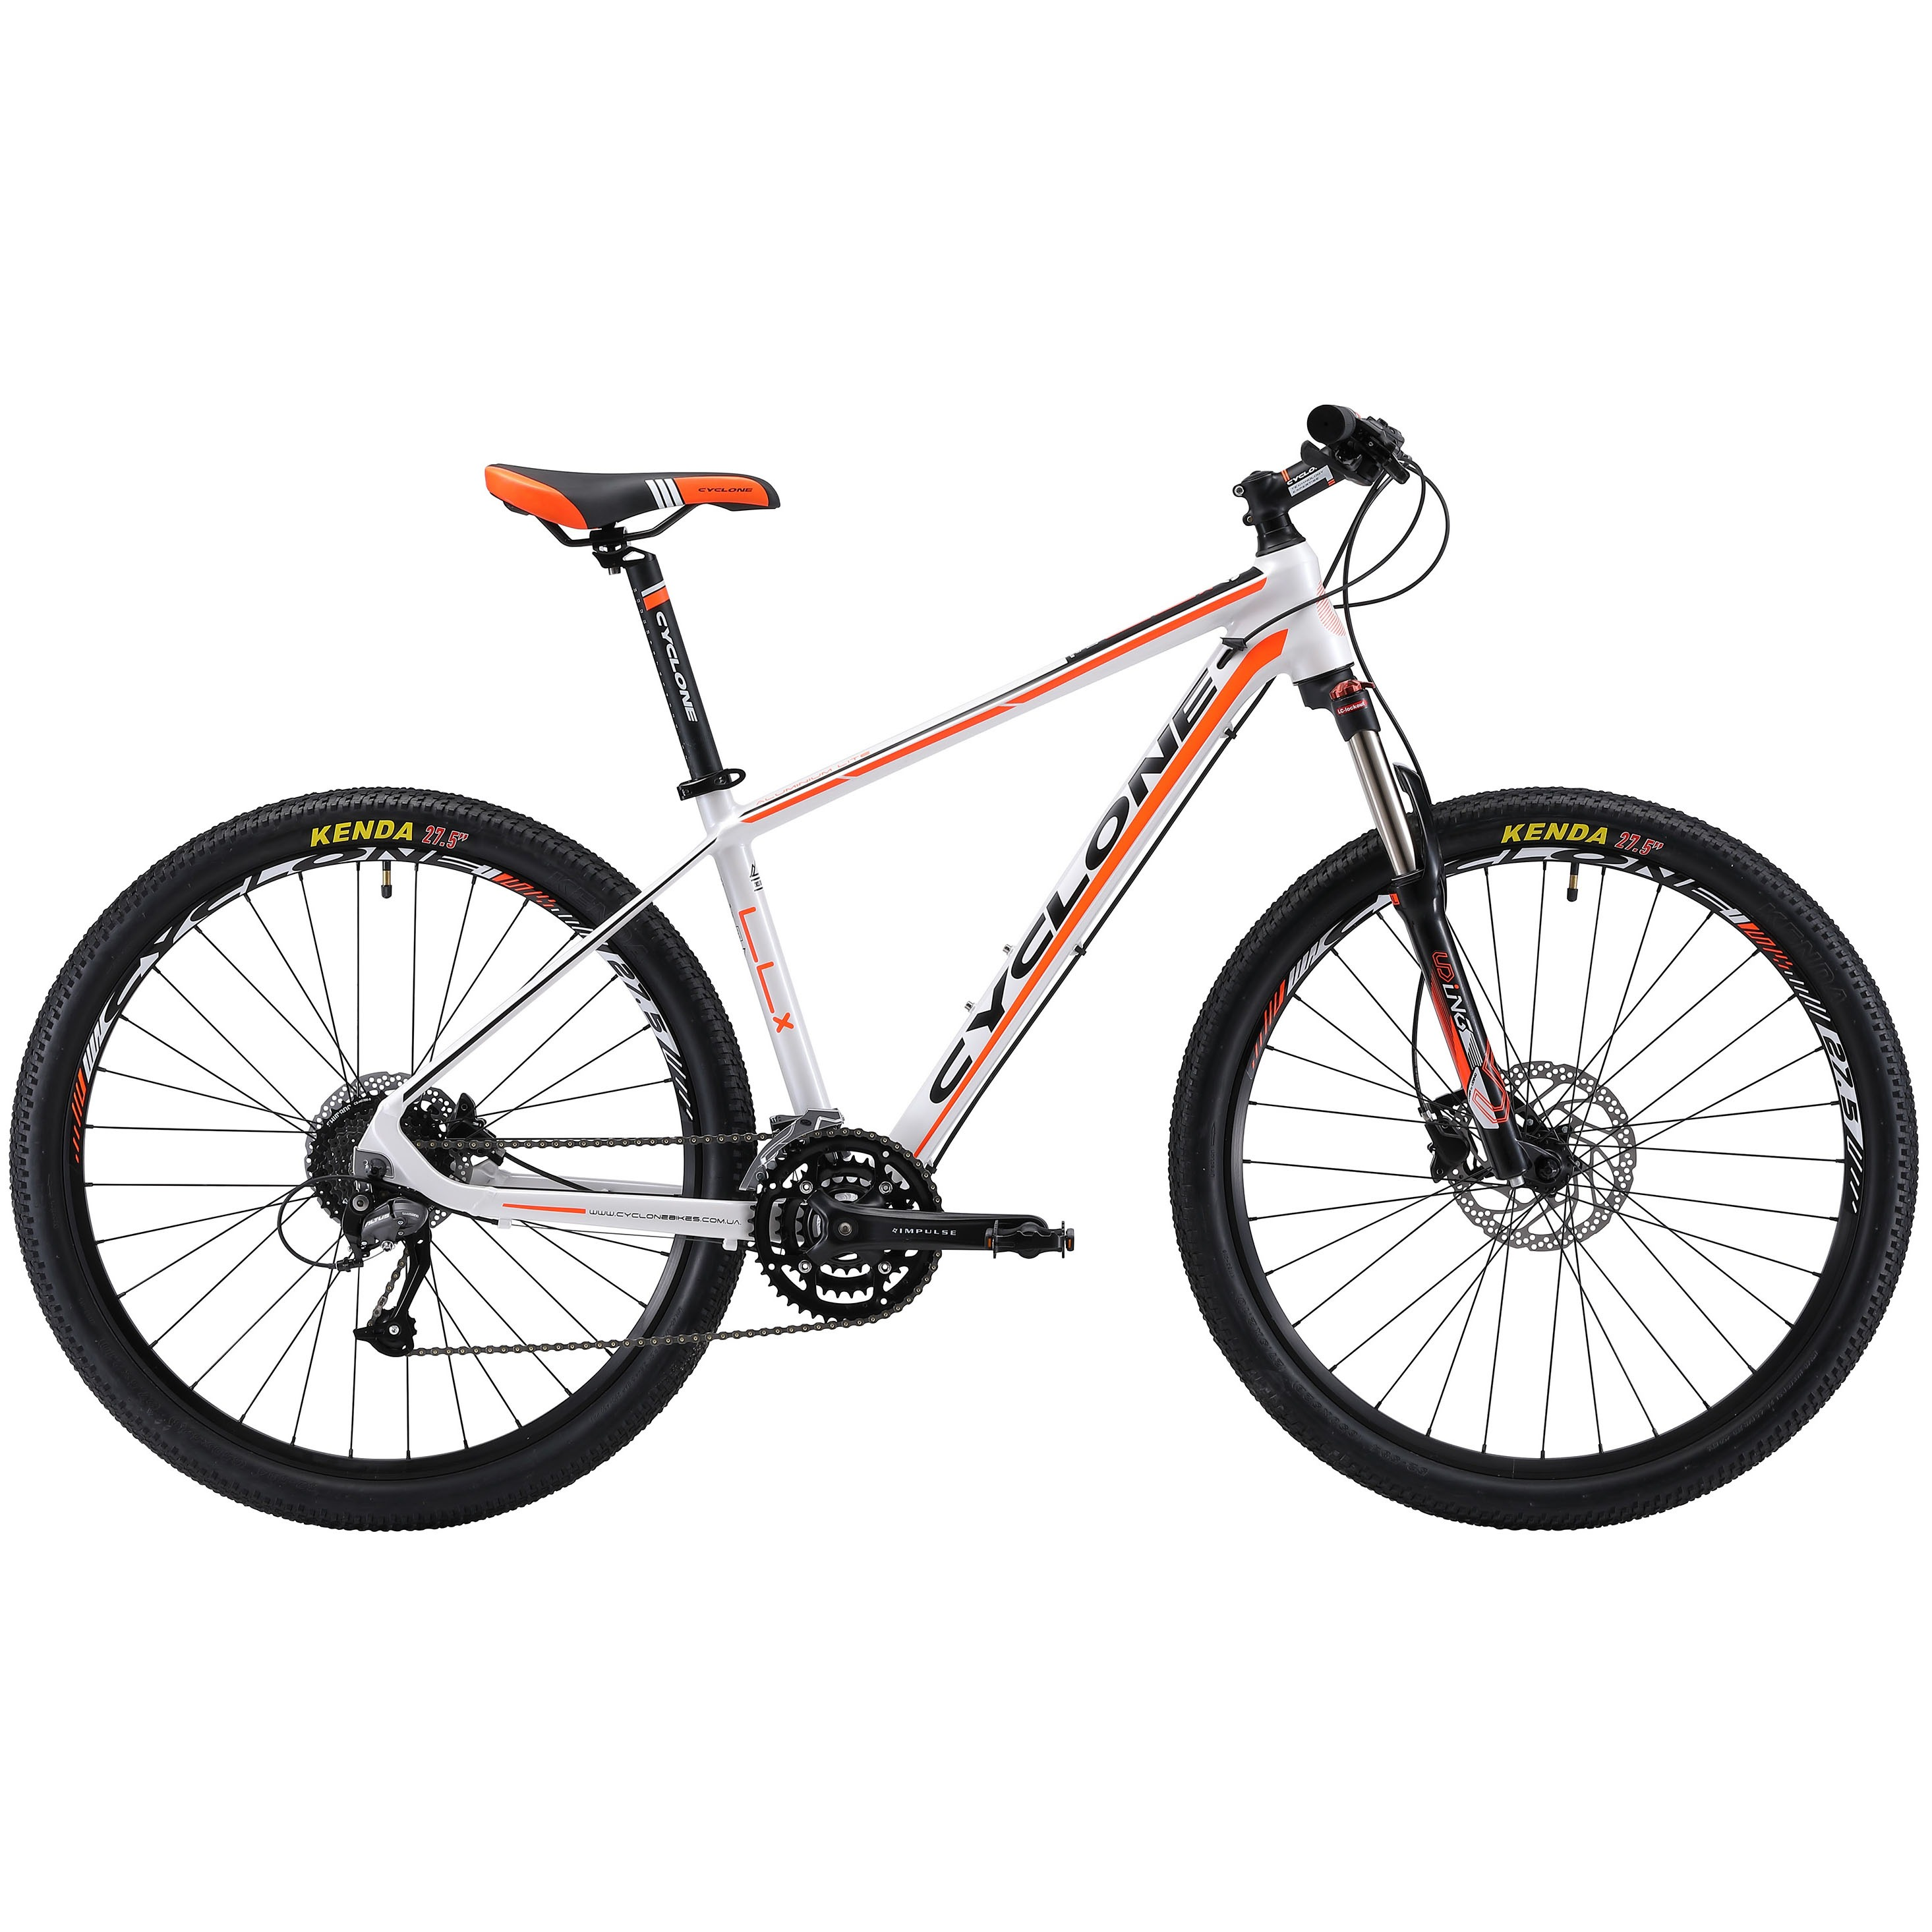 Фото Горный Велосипед Сyclone 27,5″ LLX-650b  15,5″ (бело-оранж-мат)